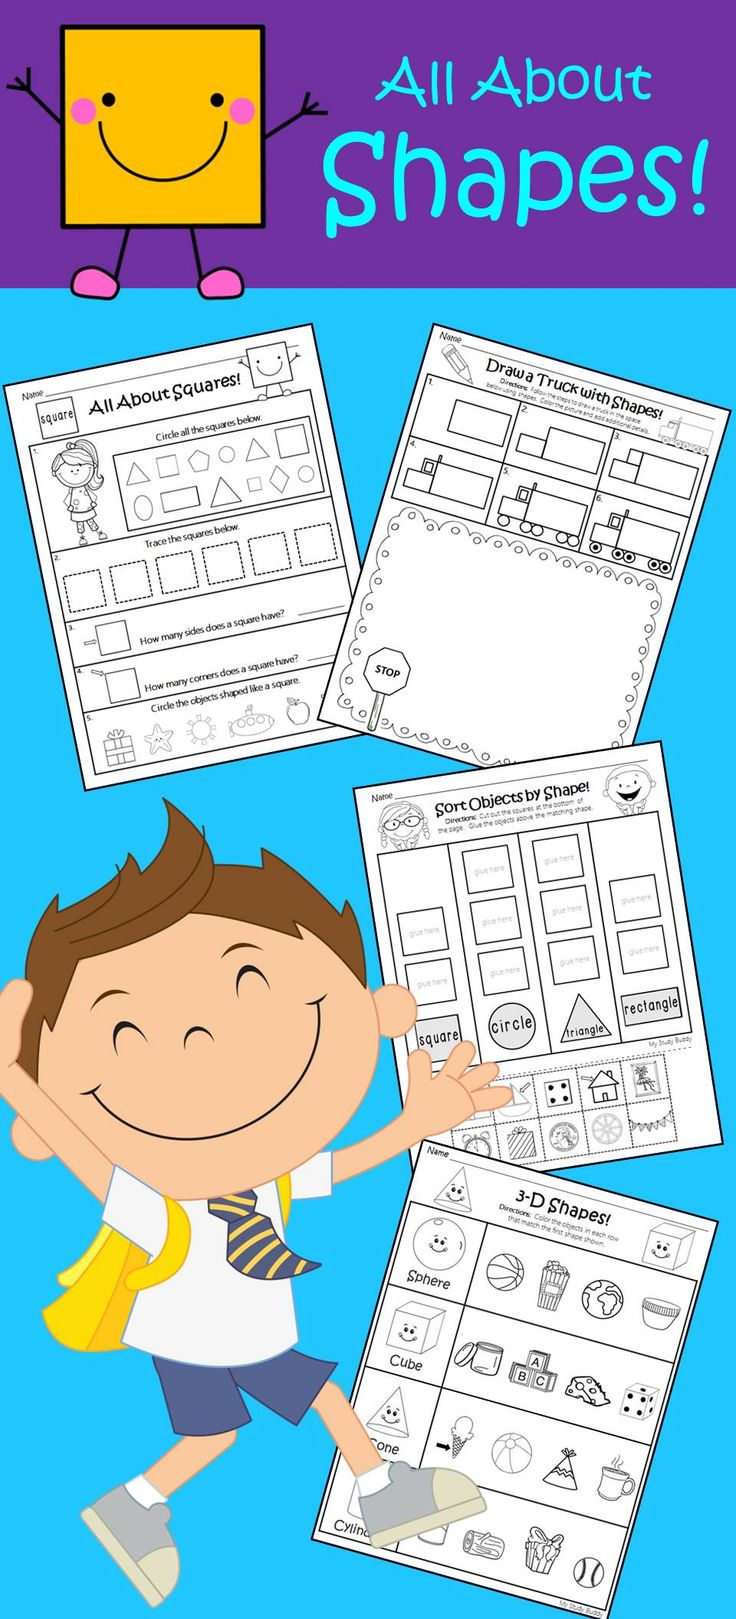 17 best Preschool - Shapes images on Pinterest | Preschool shapes ...